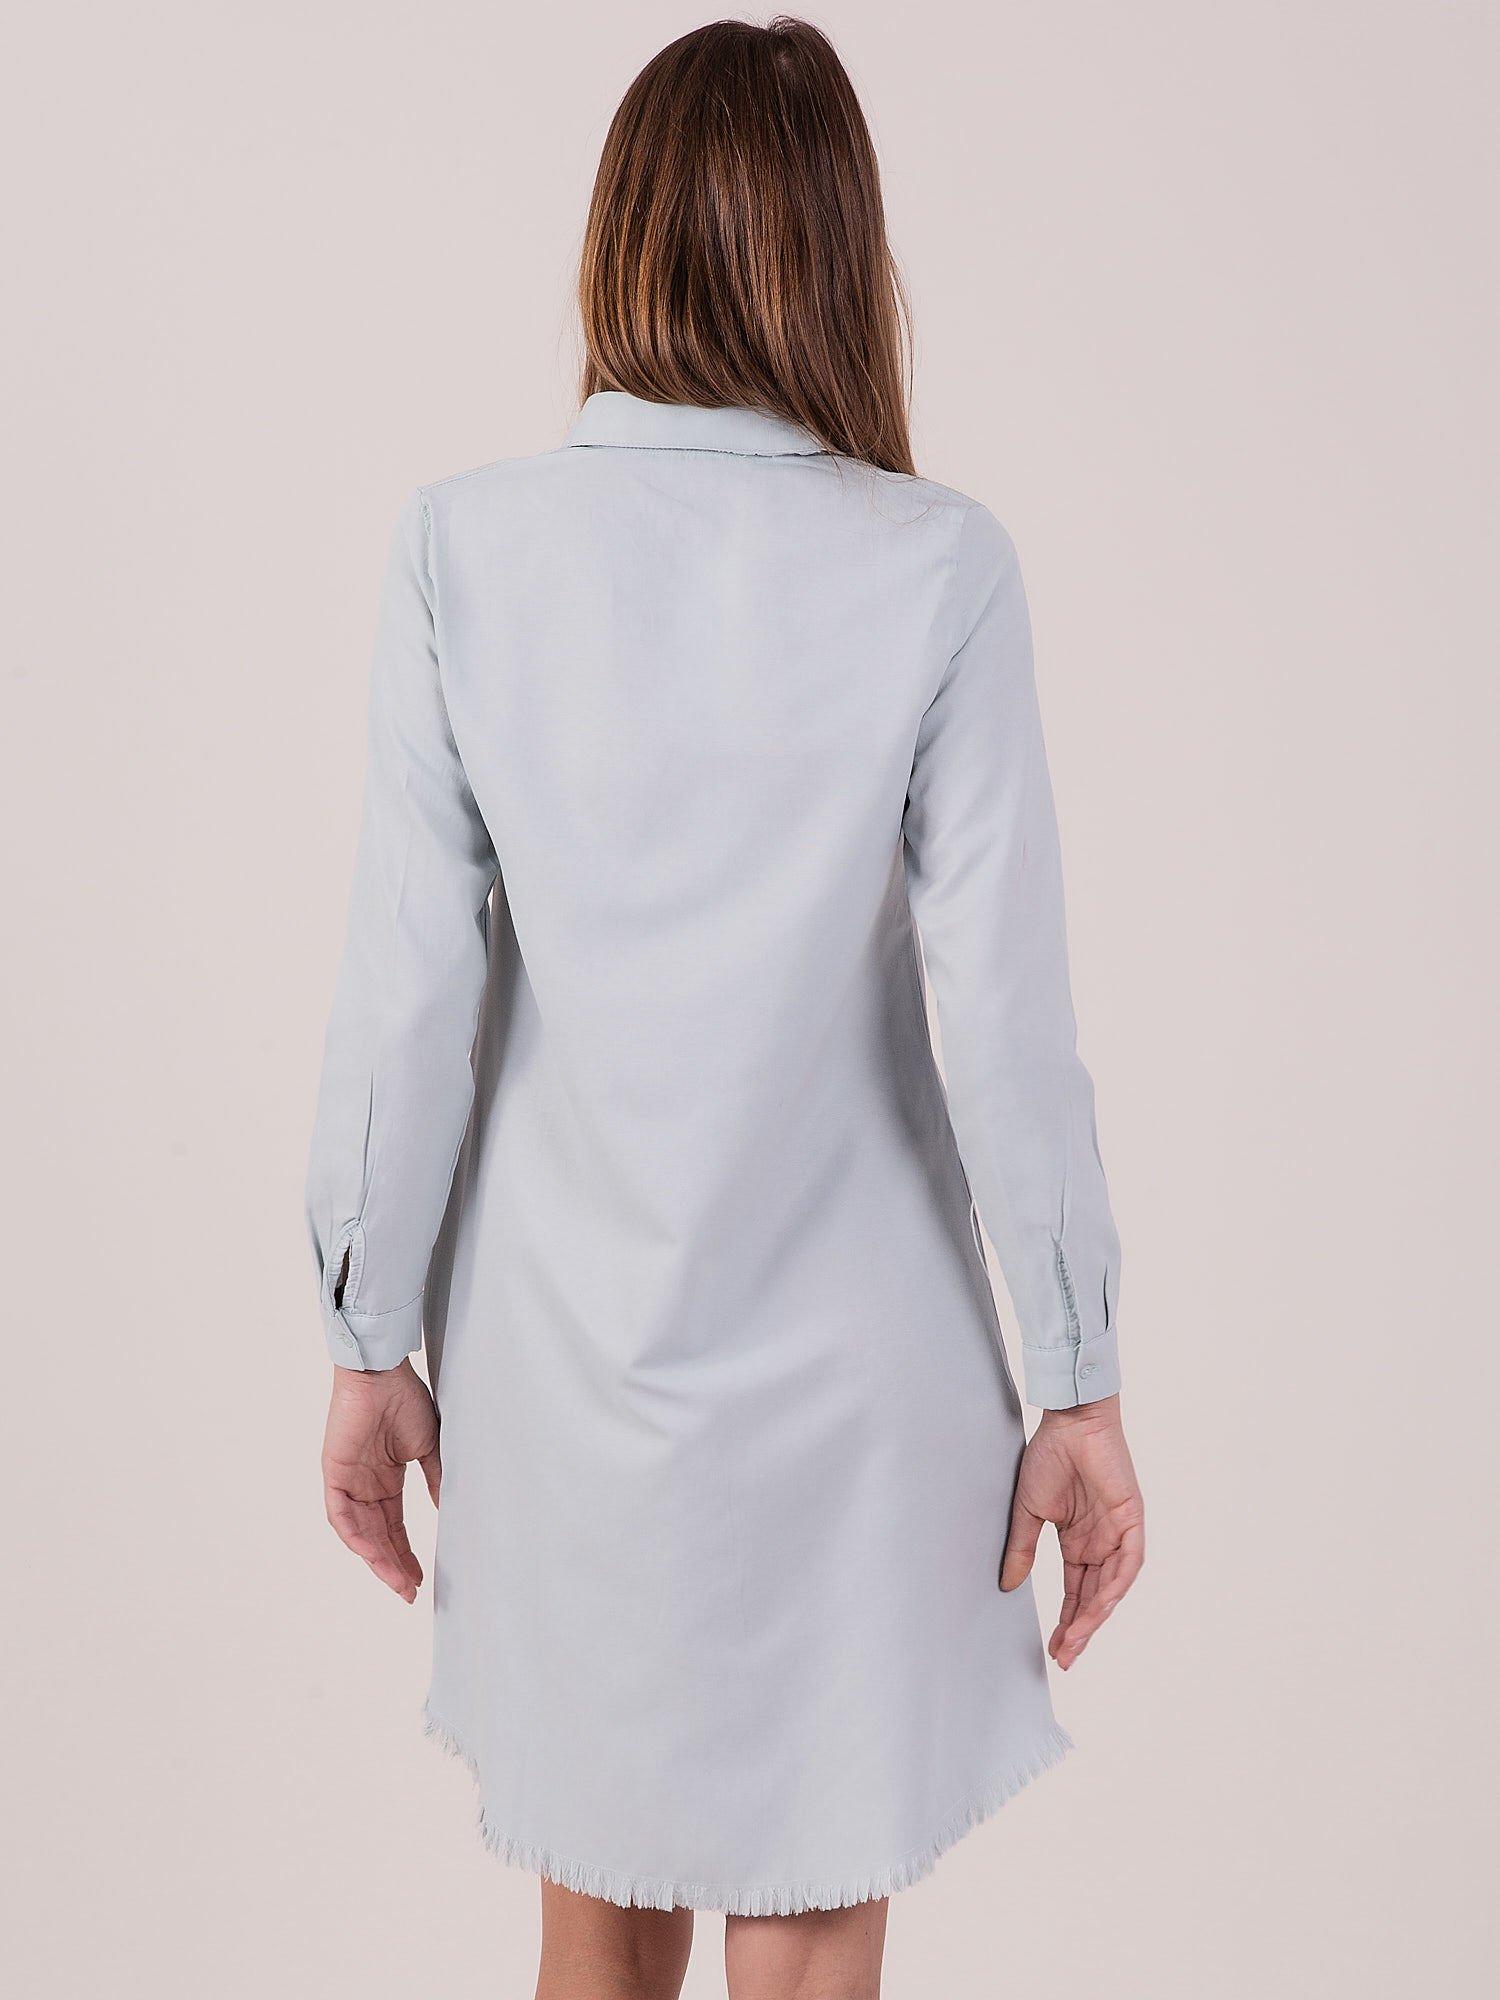 3e1a61b2 Jasnoniebieska sukienka zapinana na guziki